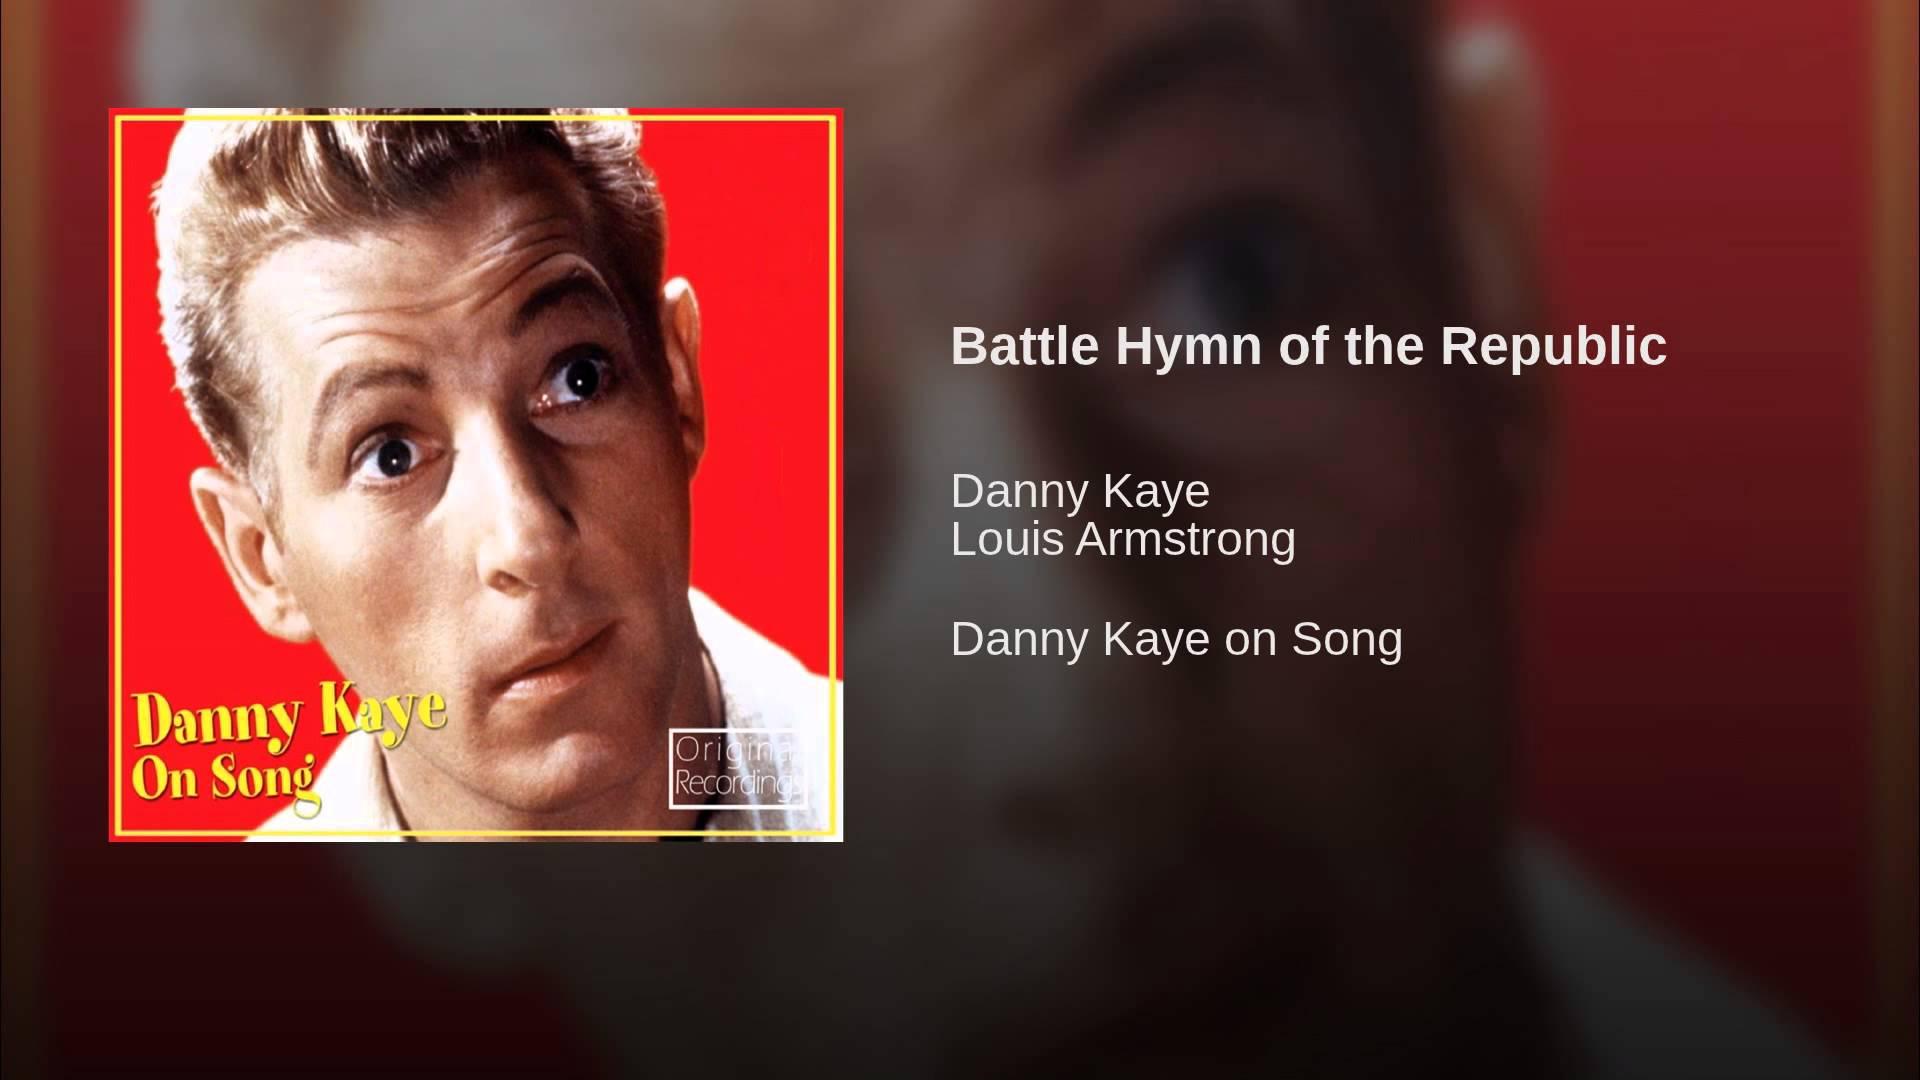 The Battle Hymn of the Republic lyrics (1862). Music by William Steffe, lyrics by Julia Ward Howe